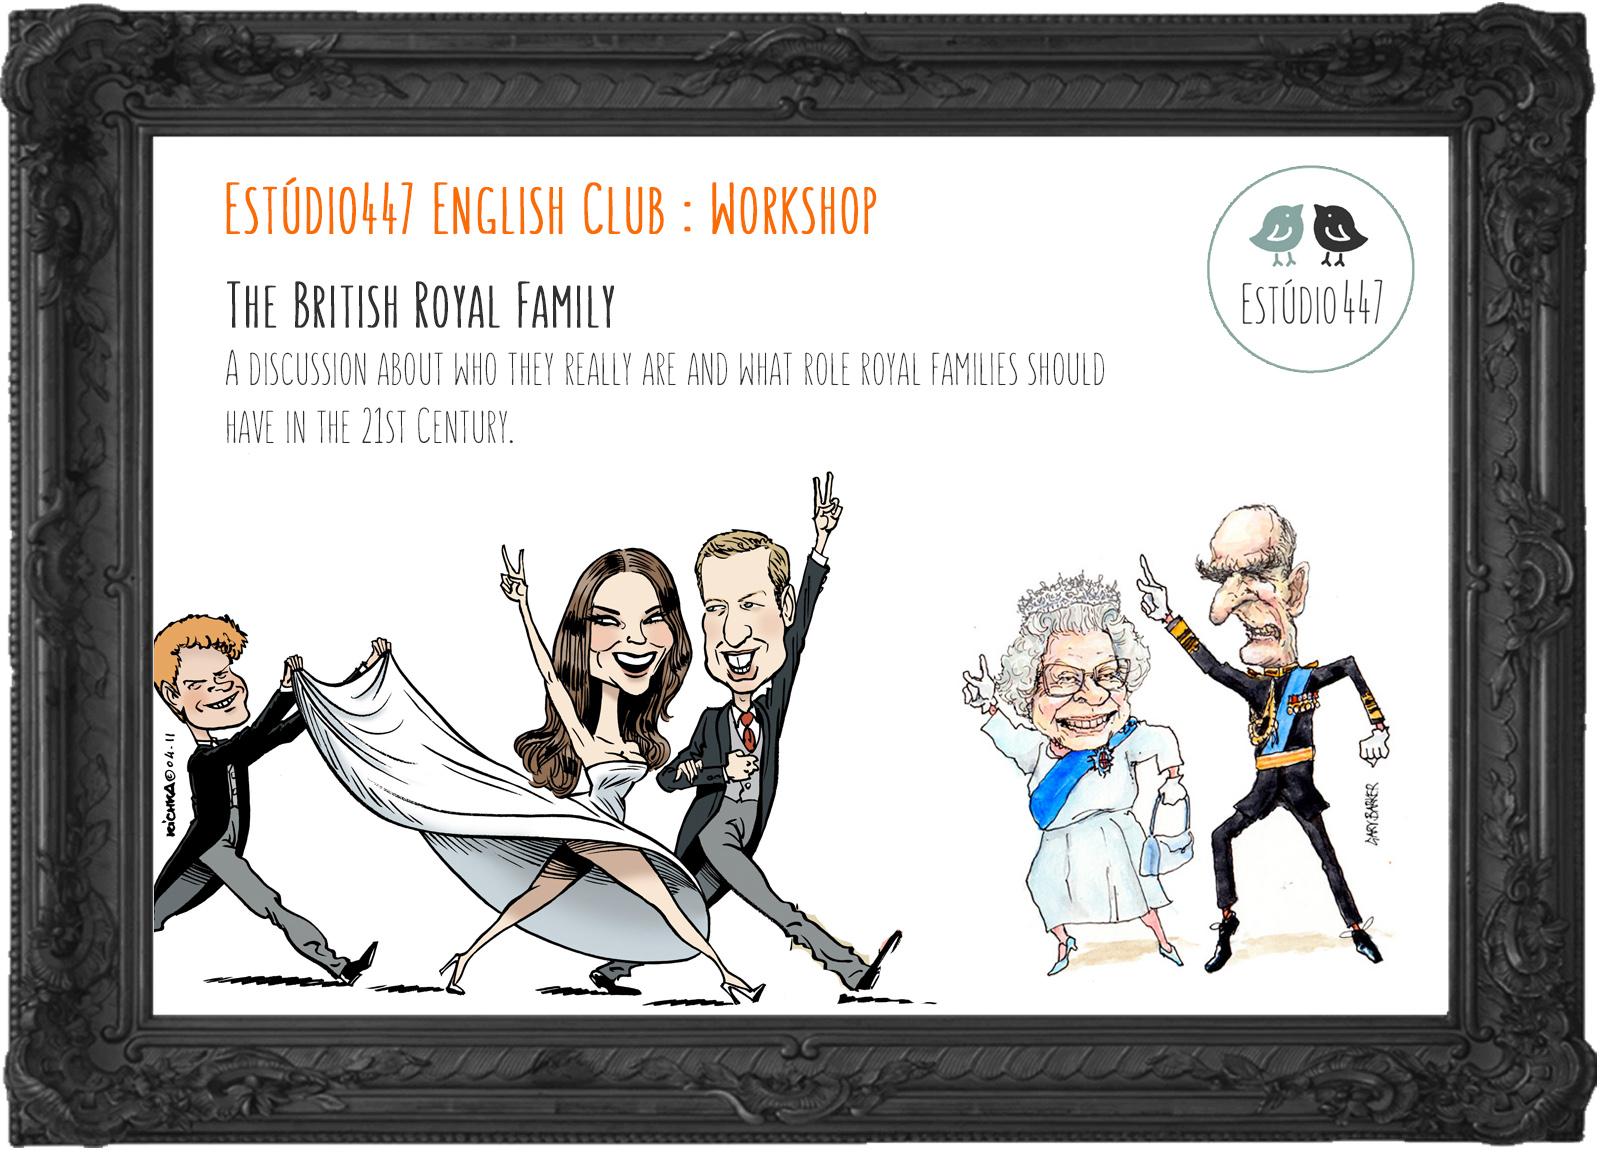 The British Royal Family Workshop - Estúdio447 Coworking Moema & English Club